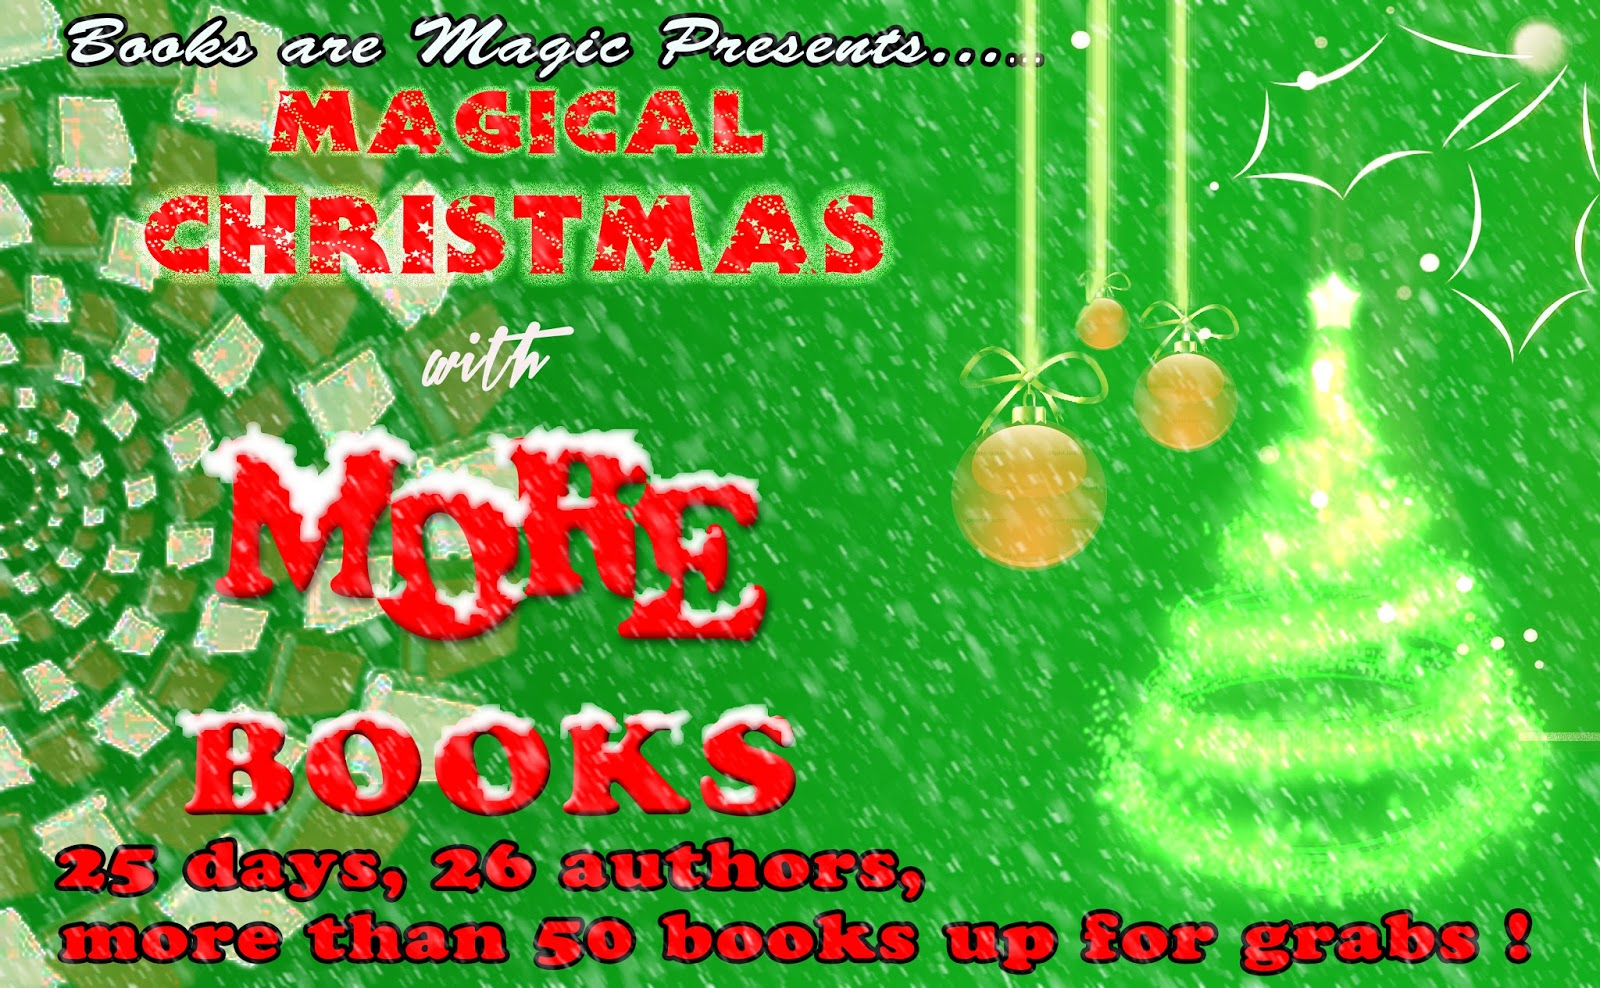 Book Giveaways International